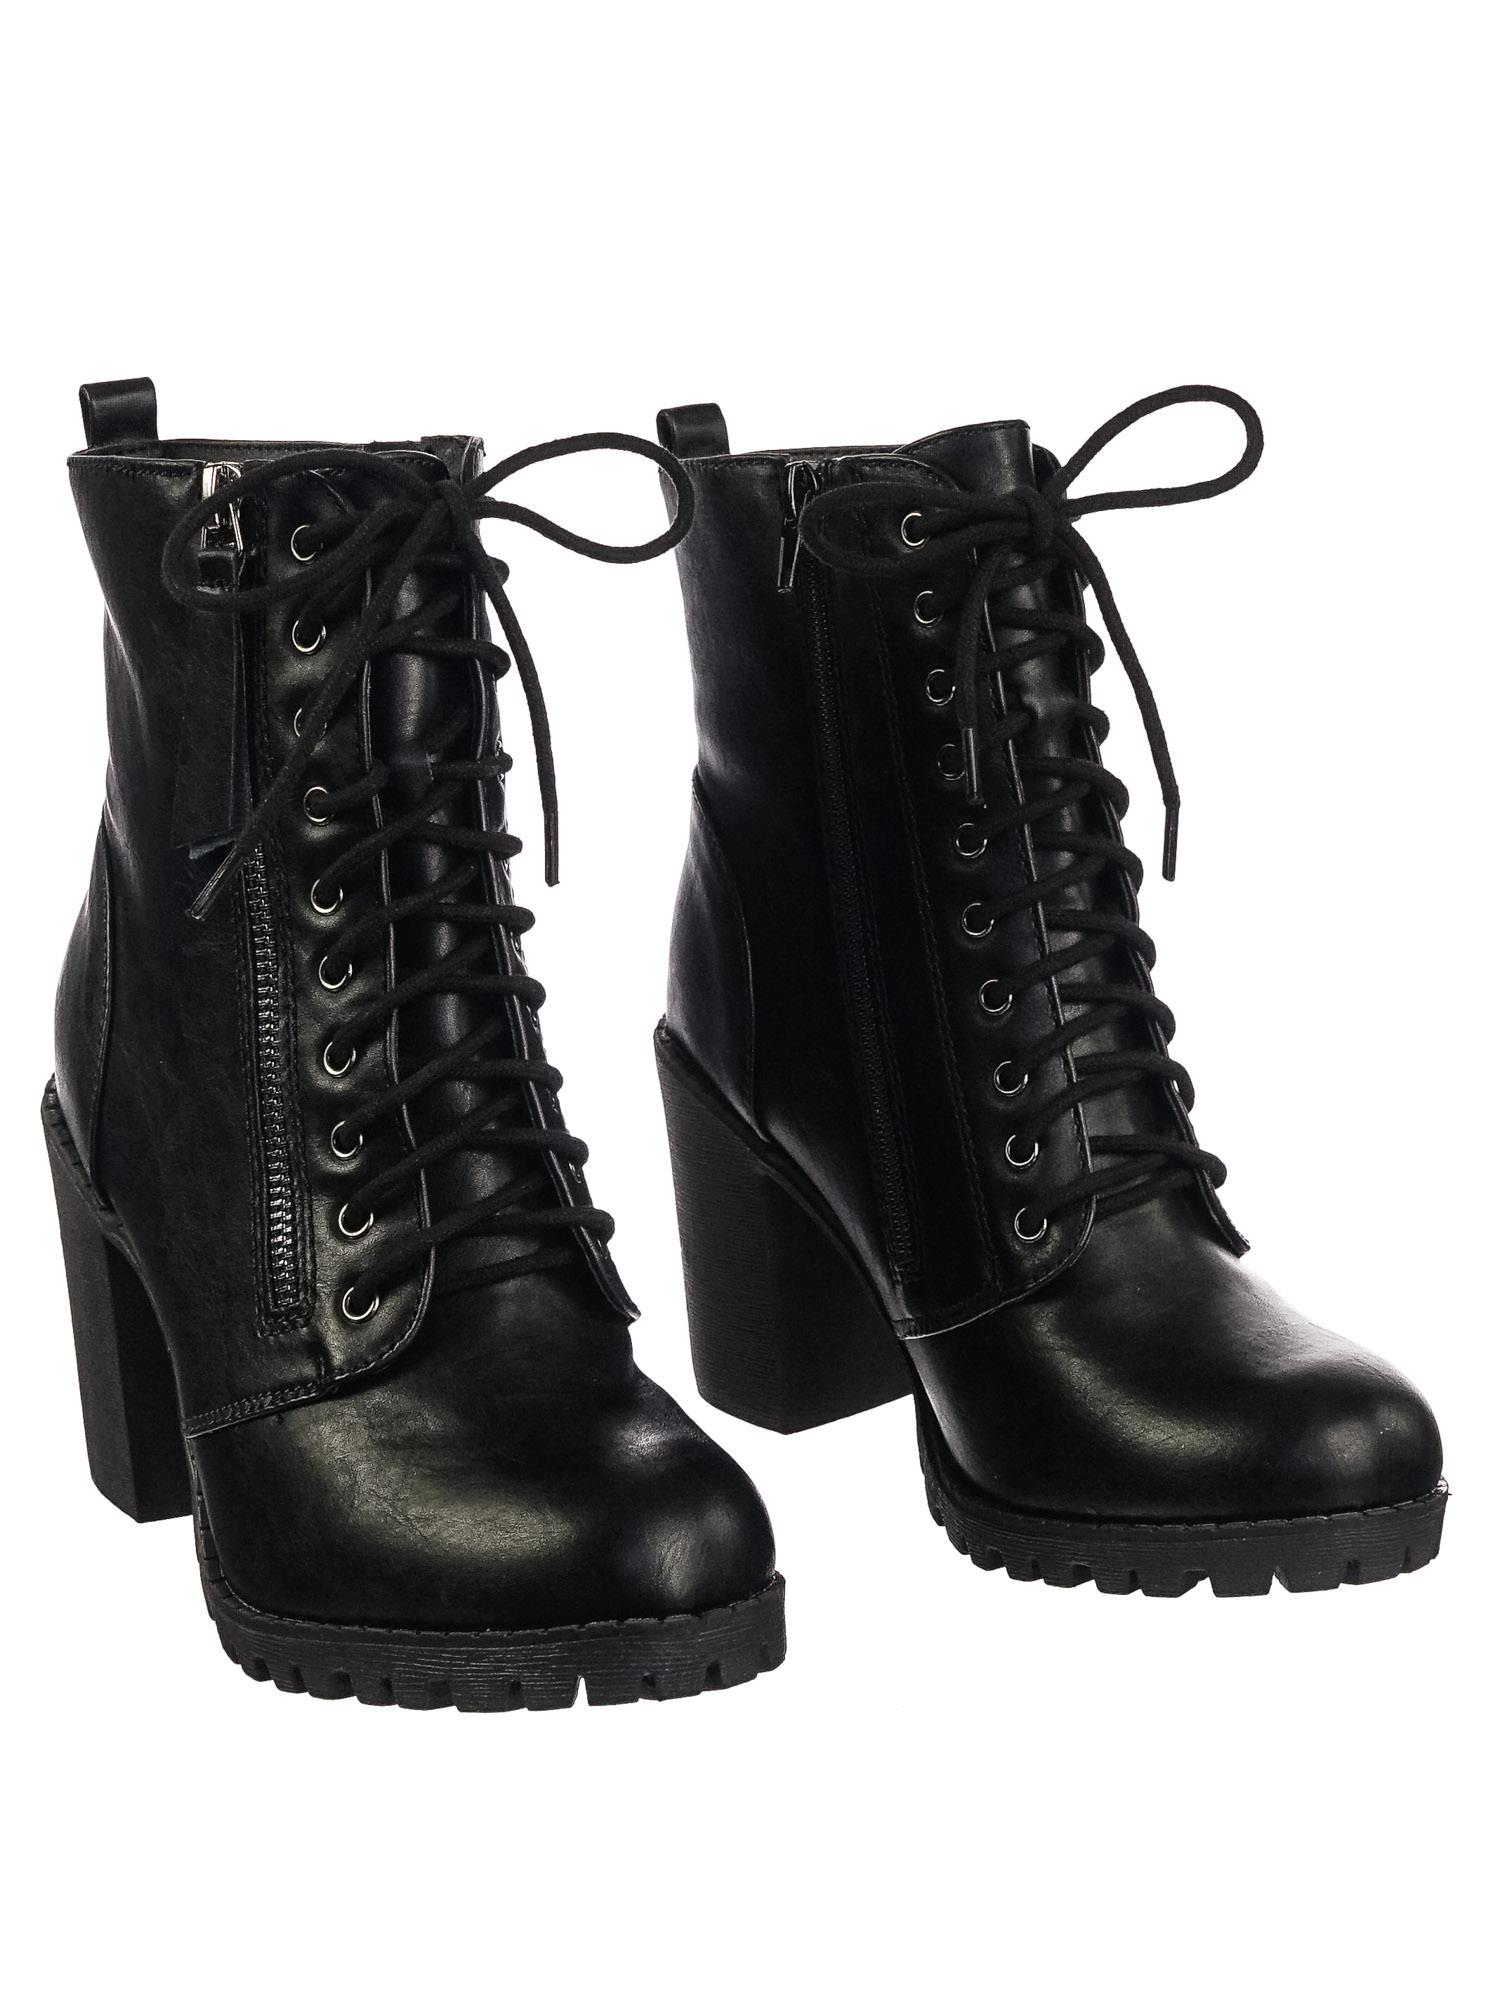 385afb83aa54 Malia Black Pu by Soda Military Lace Up Combat Ankle Boot On Chunky Block  Heel Lug